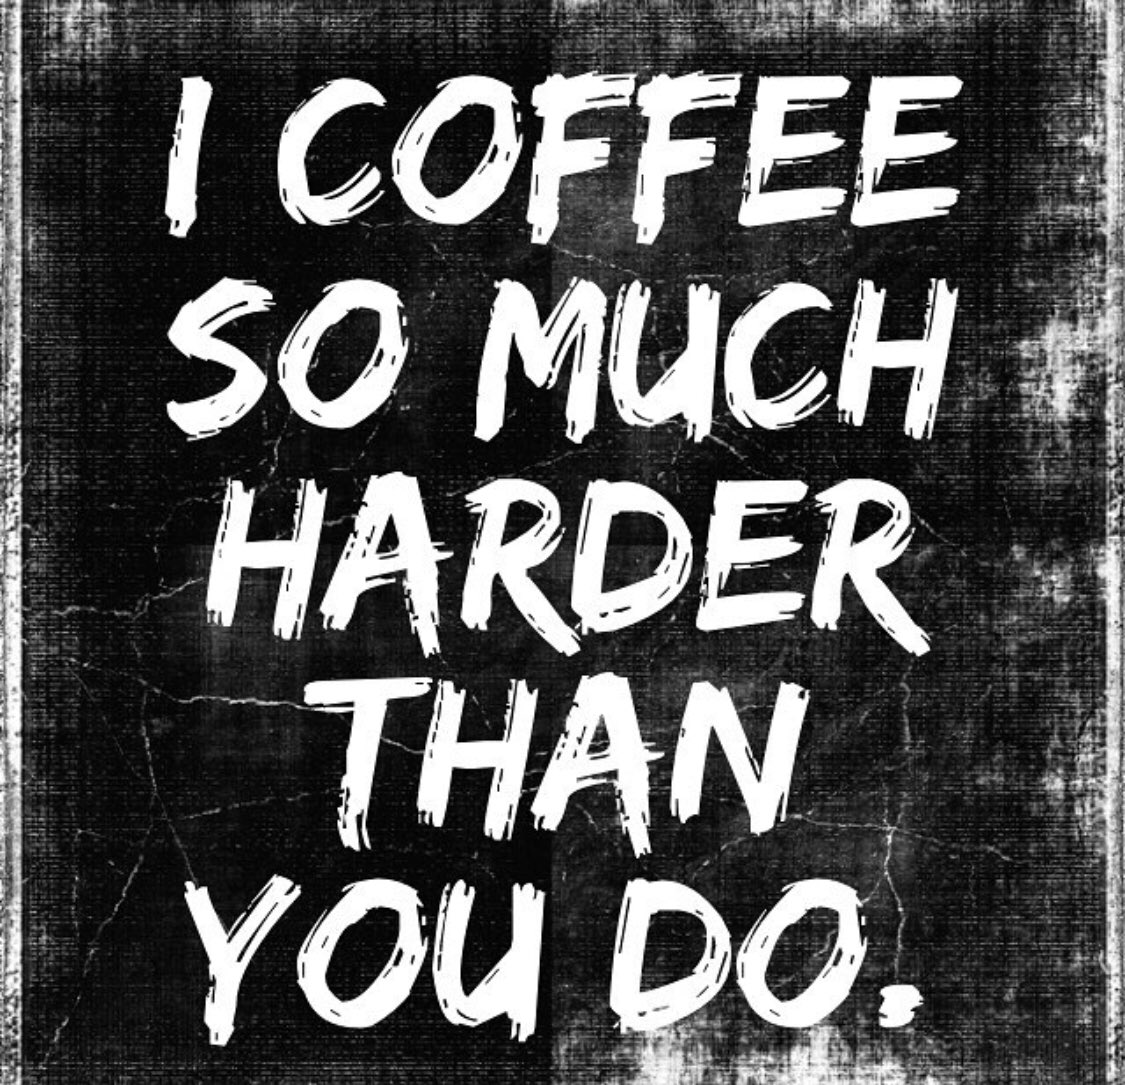 wiredcoffeebar (@GetWiredCoffee) | Twitter